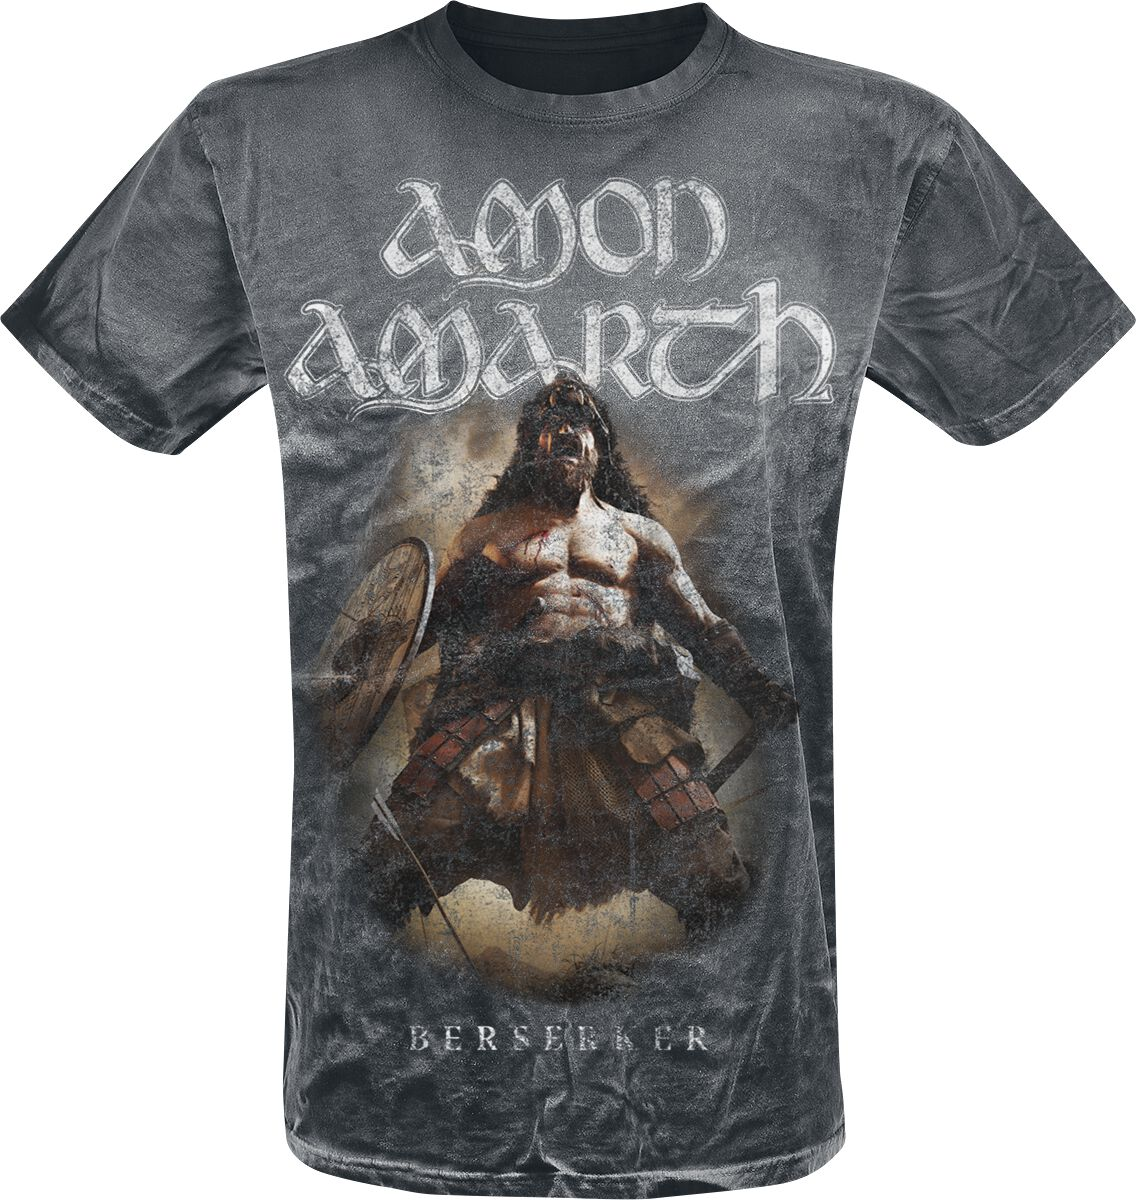 Image of Amon Amarth Berserker T-Shirt dunkelgrau